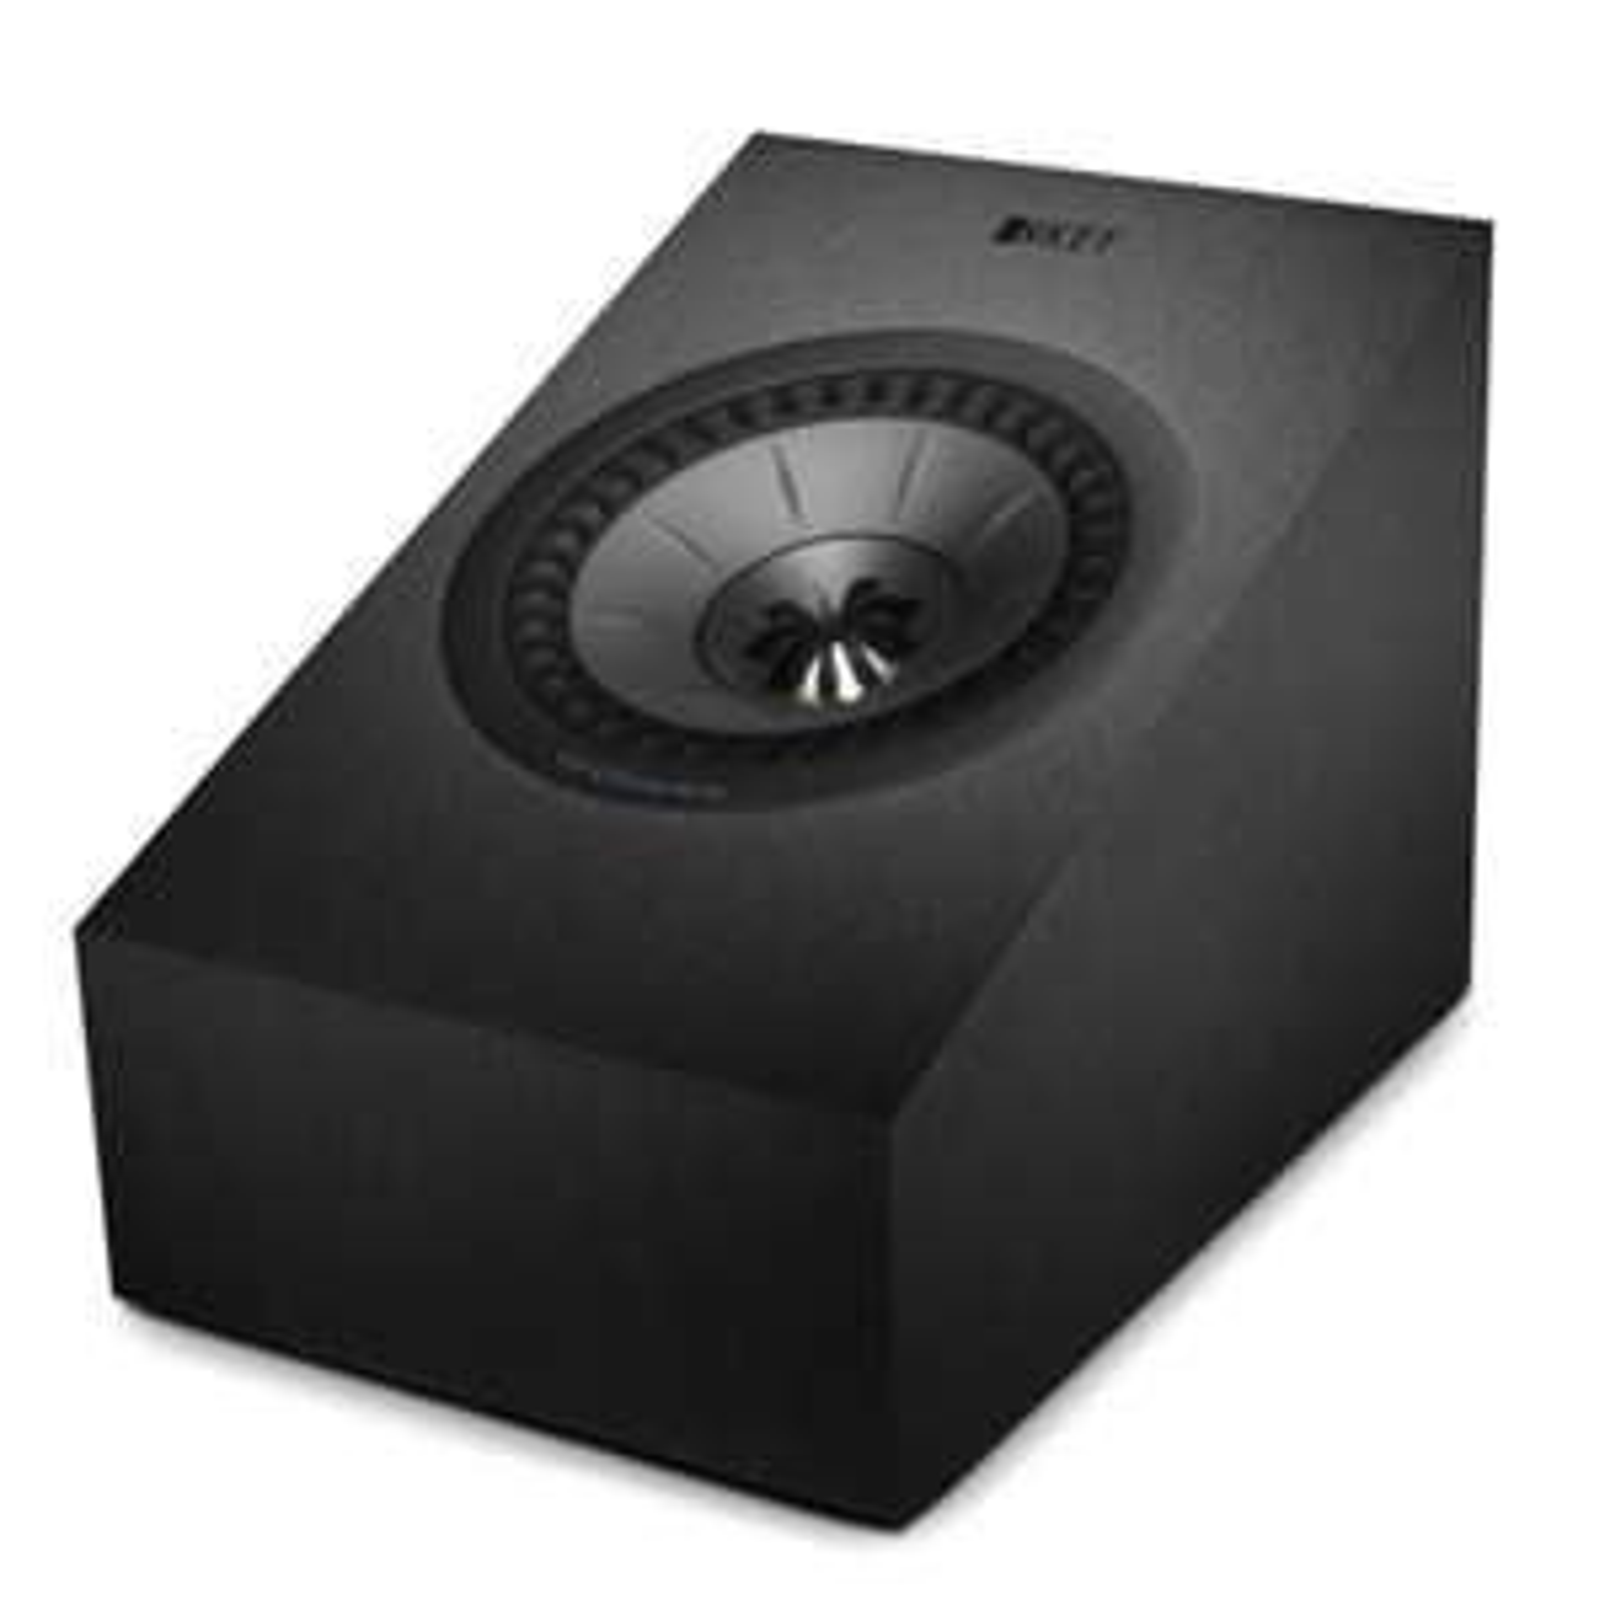 KEF Q50A Dolby Atmos-Lautsprecher (Stückpreis, 2-Wege, 2,5cm Hochtöner, 13cm Tieftöner, 105Hz - 18,5kHz, 86dB, 4,6-8Ω)